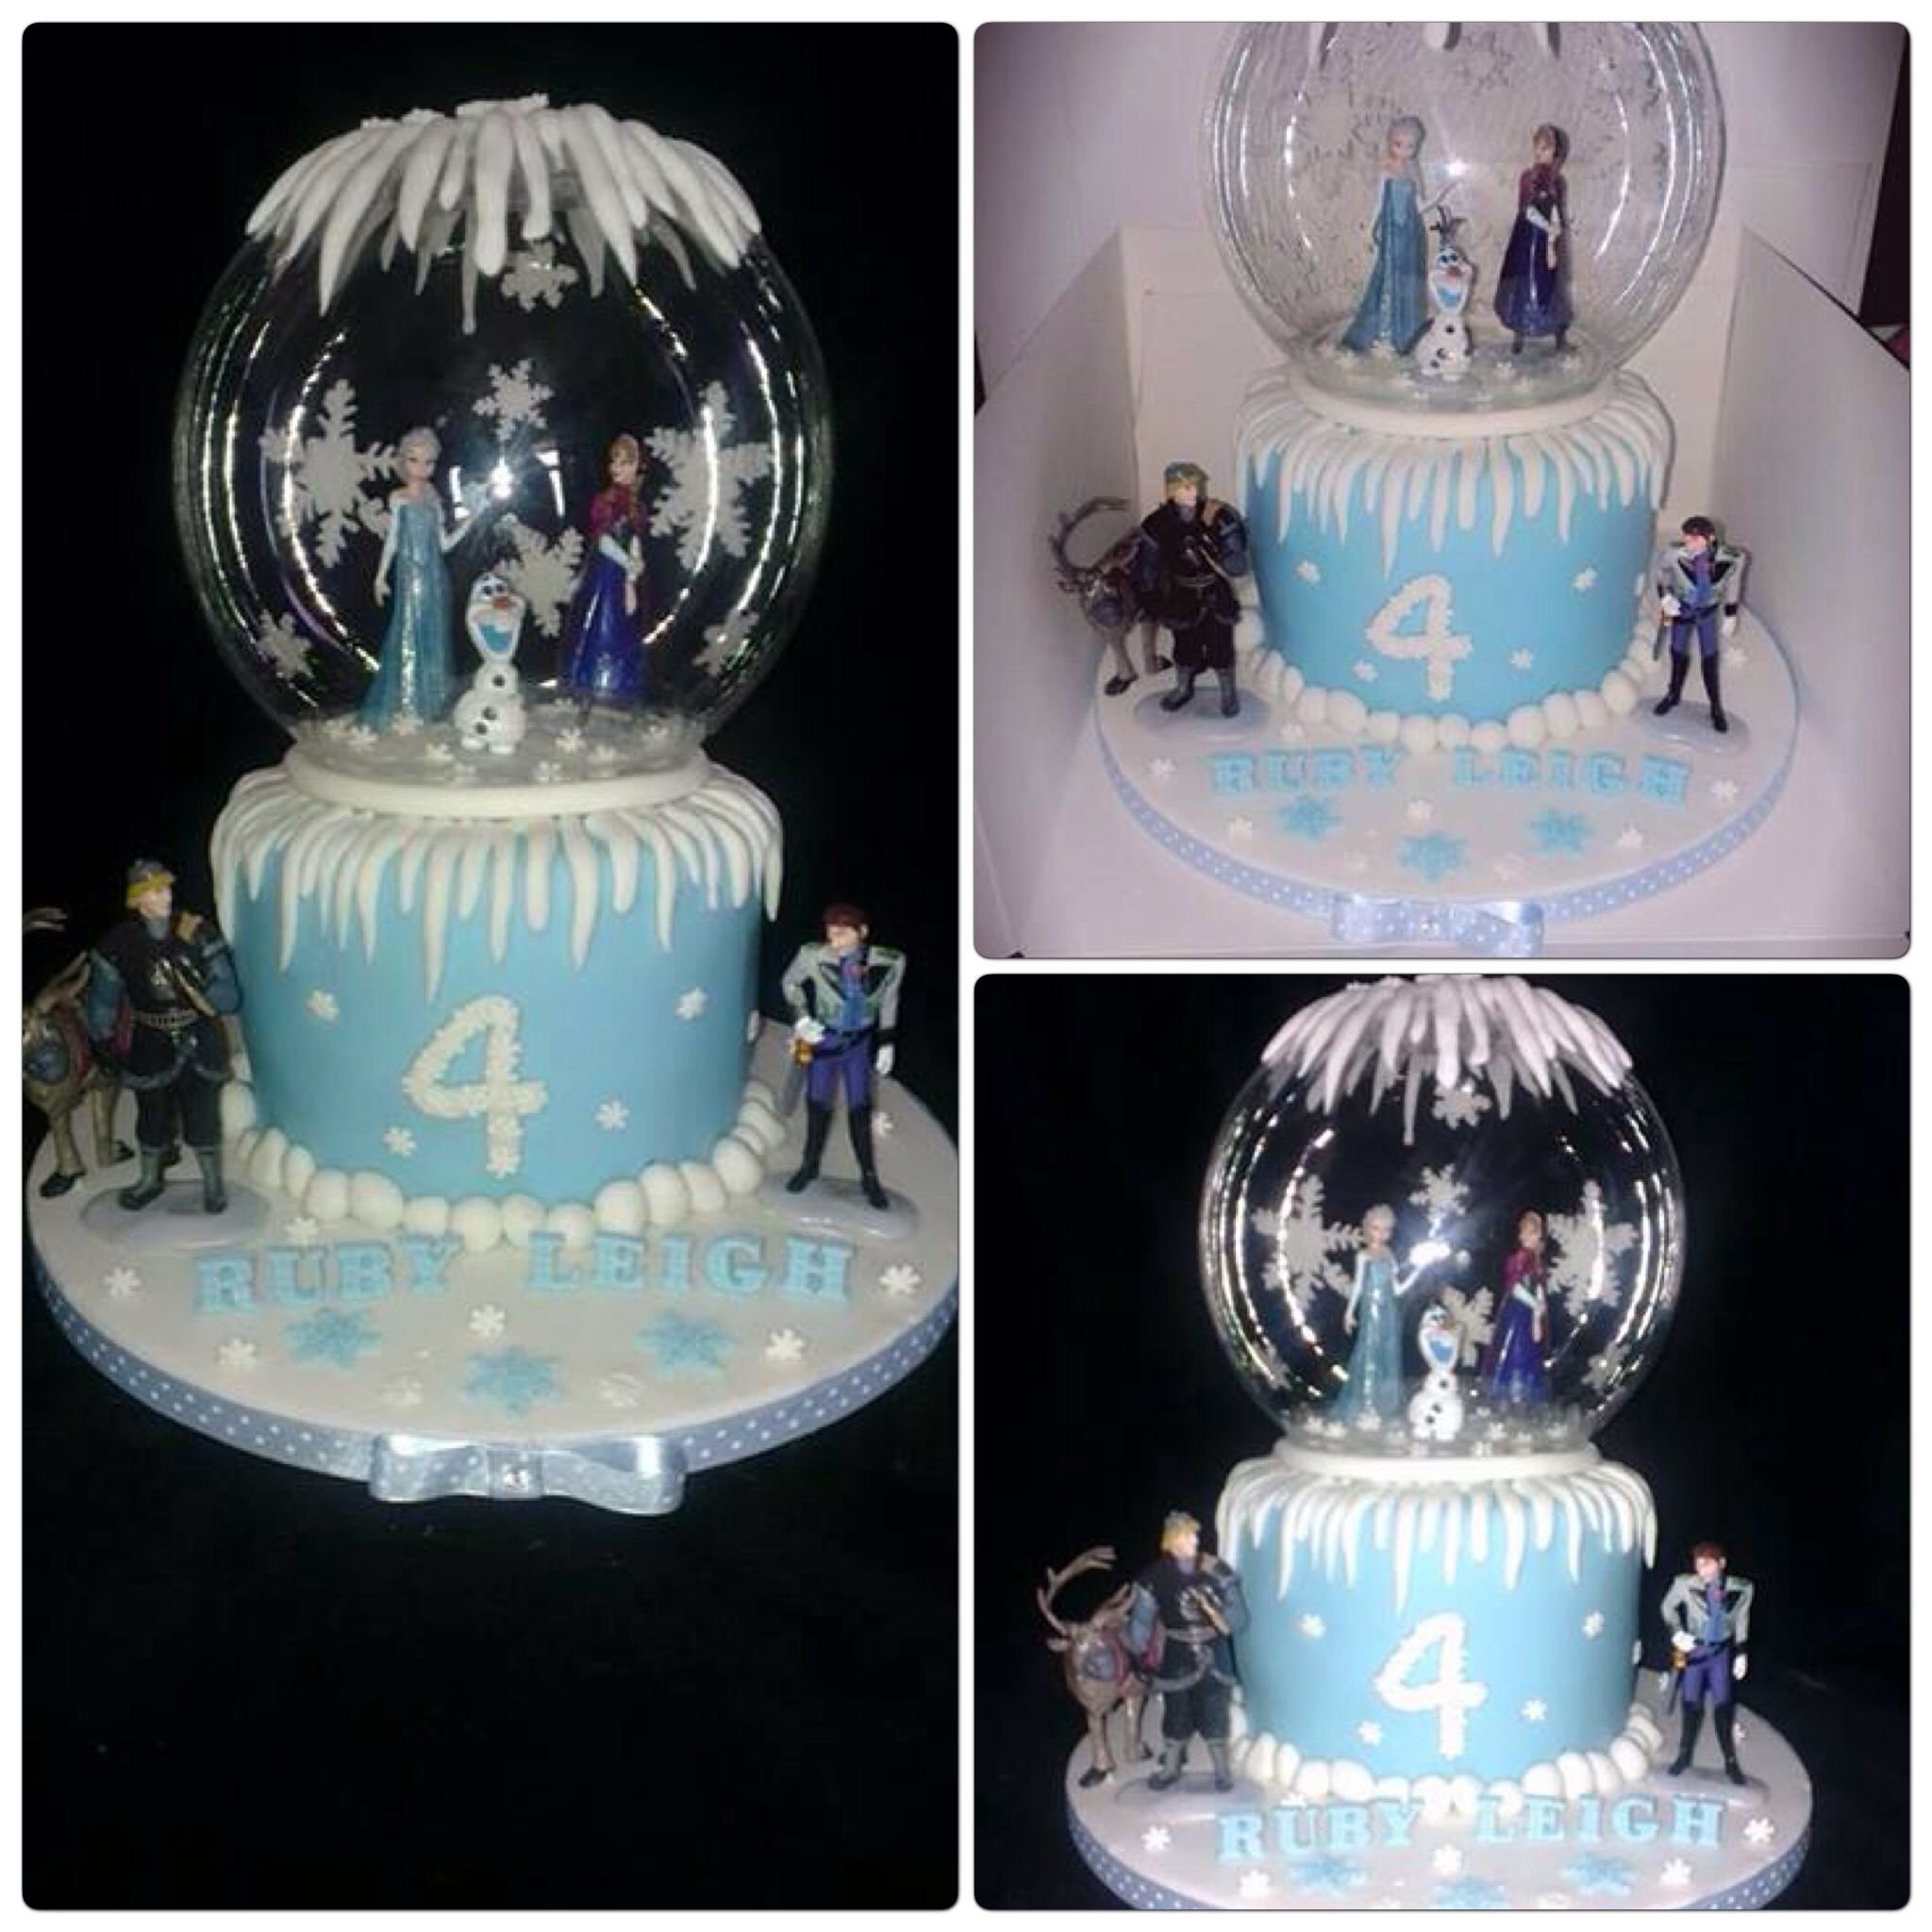 Magical Frozen themed snow globe cake Disneys Frozen Cakes